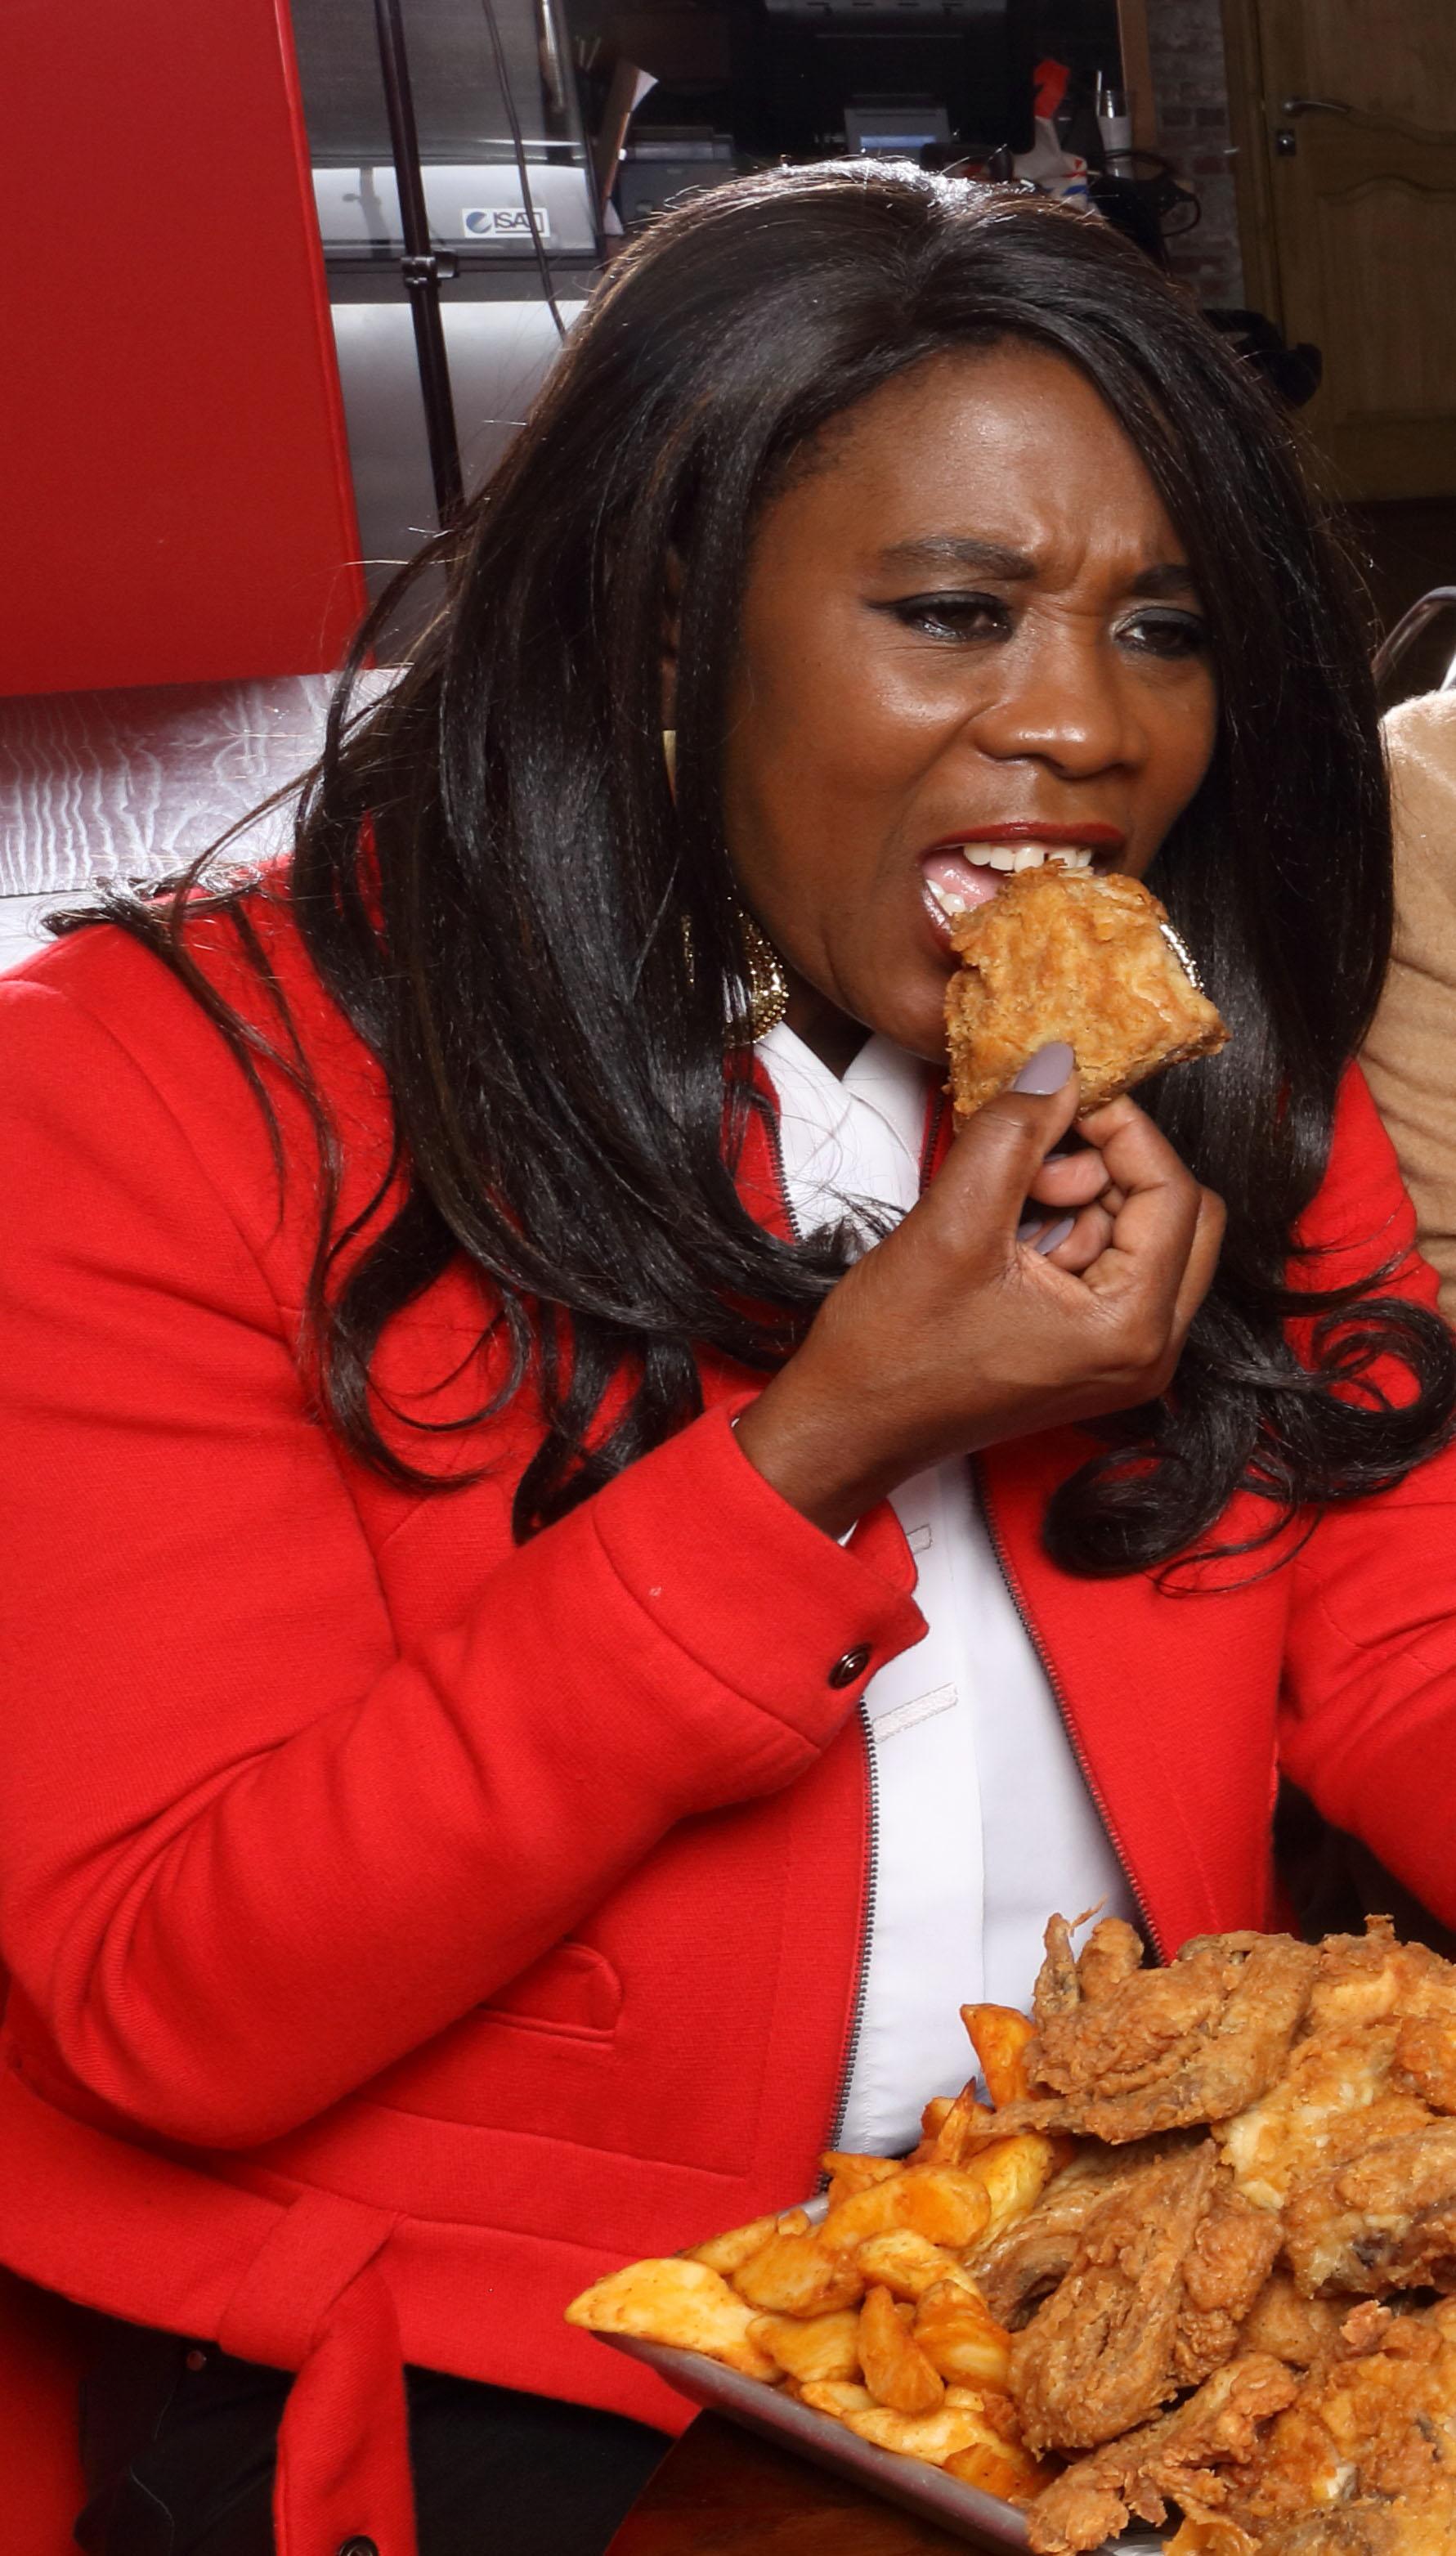 Fat girl eating food